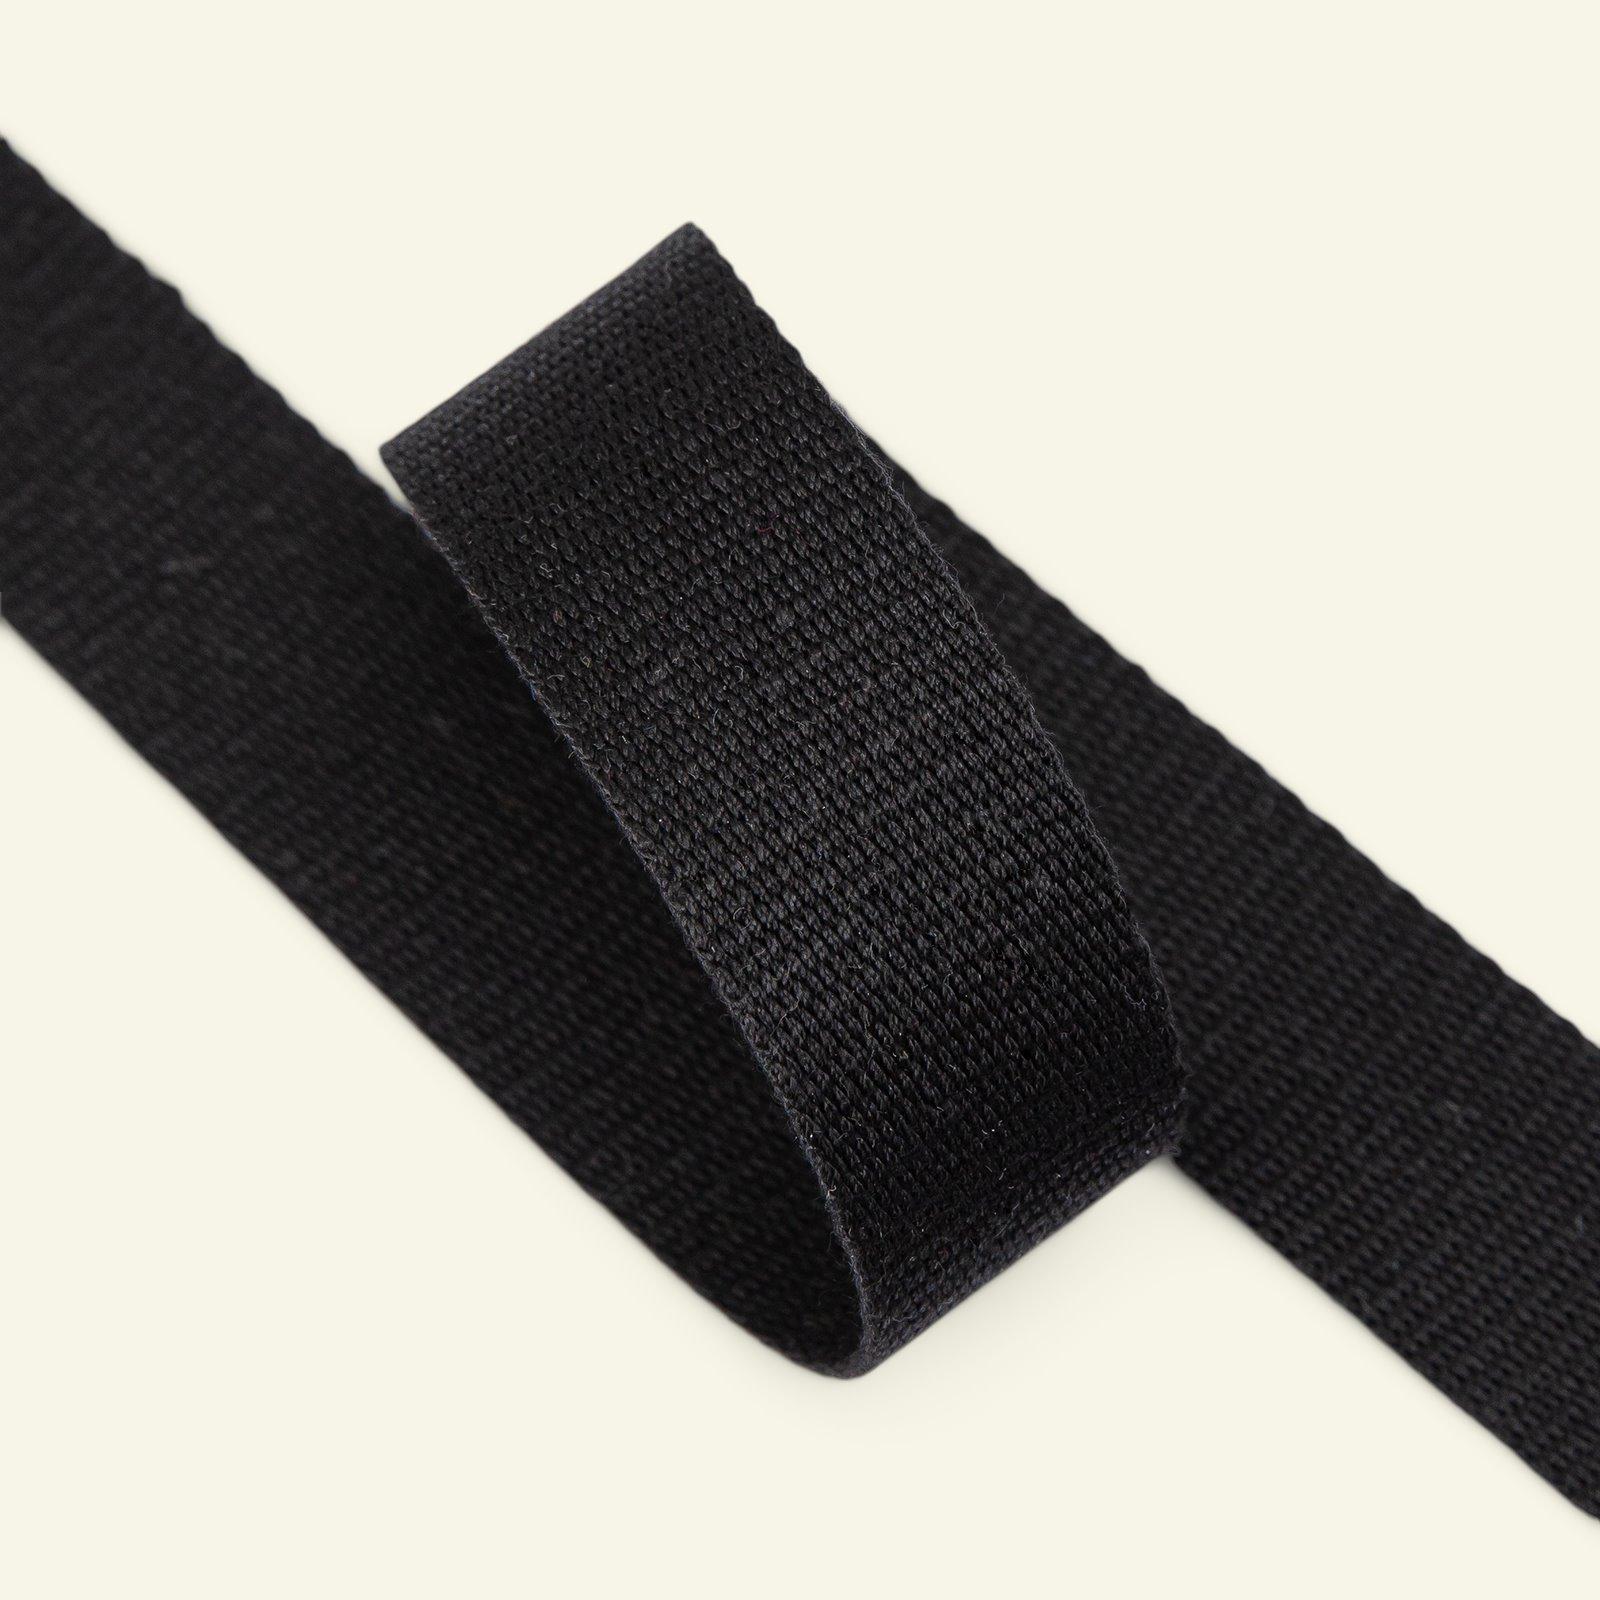 Ribbon woven 25mm black 3m 22325_pack